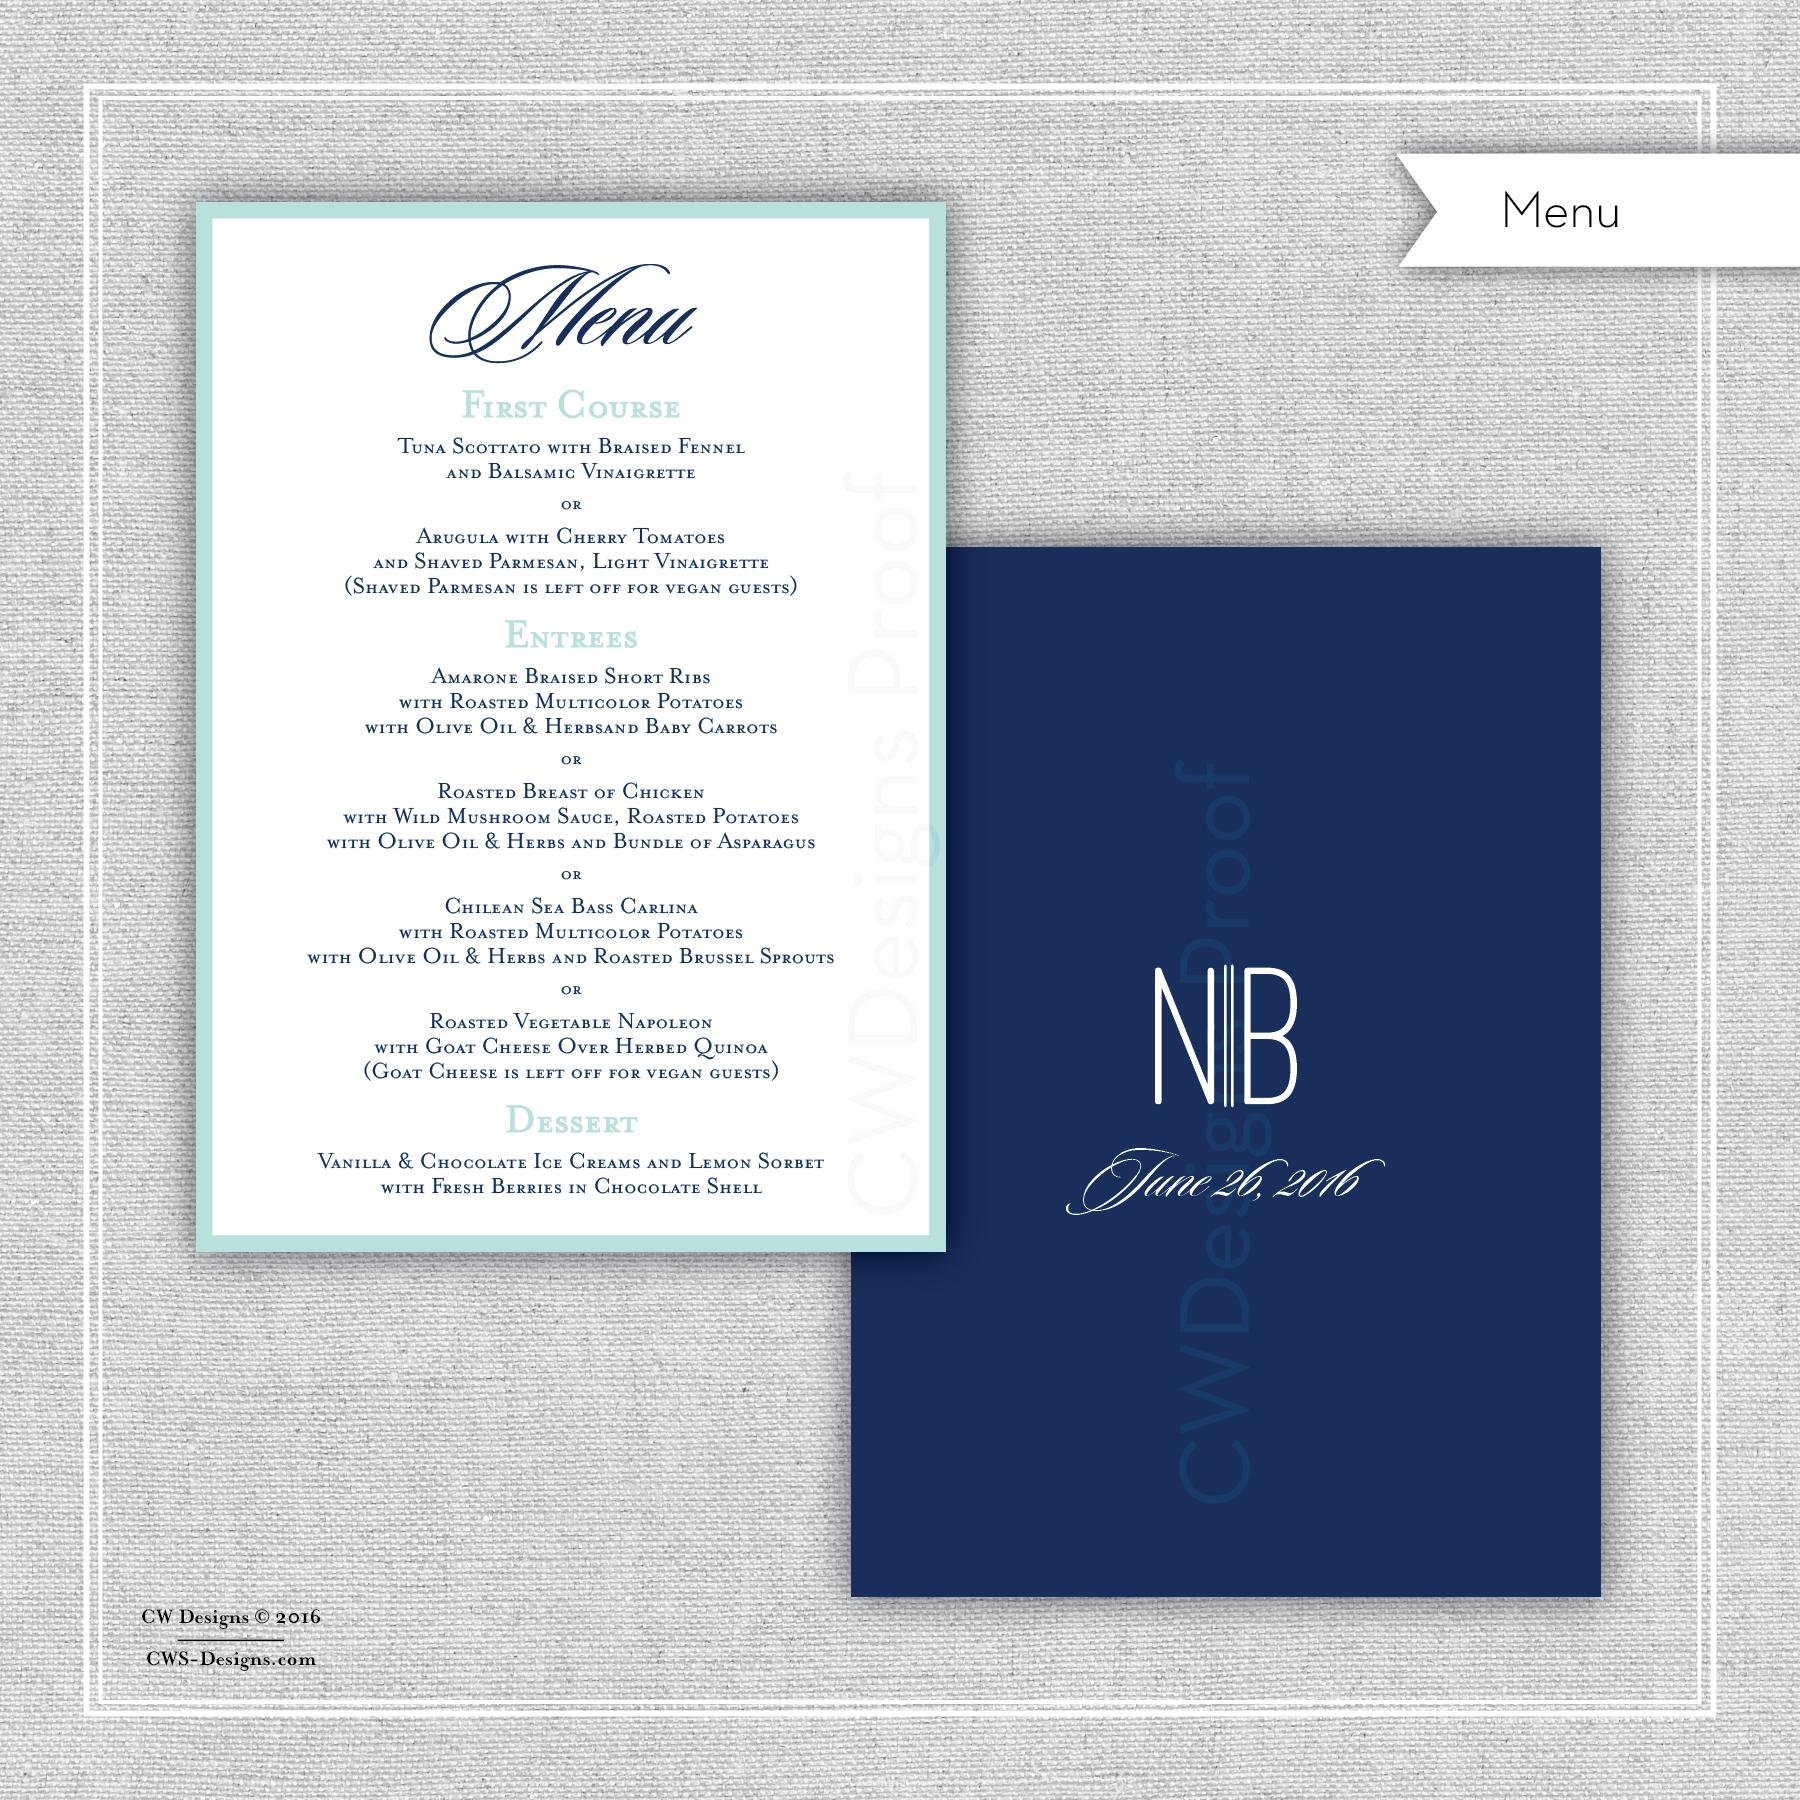 Menus Linen Background Etsy Listings-01.png